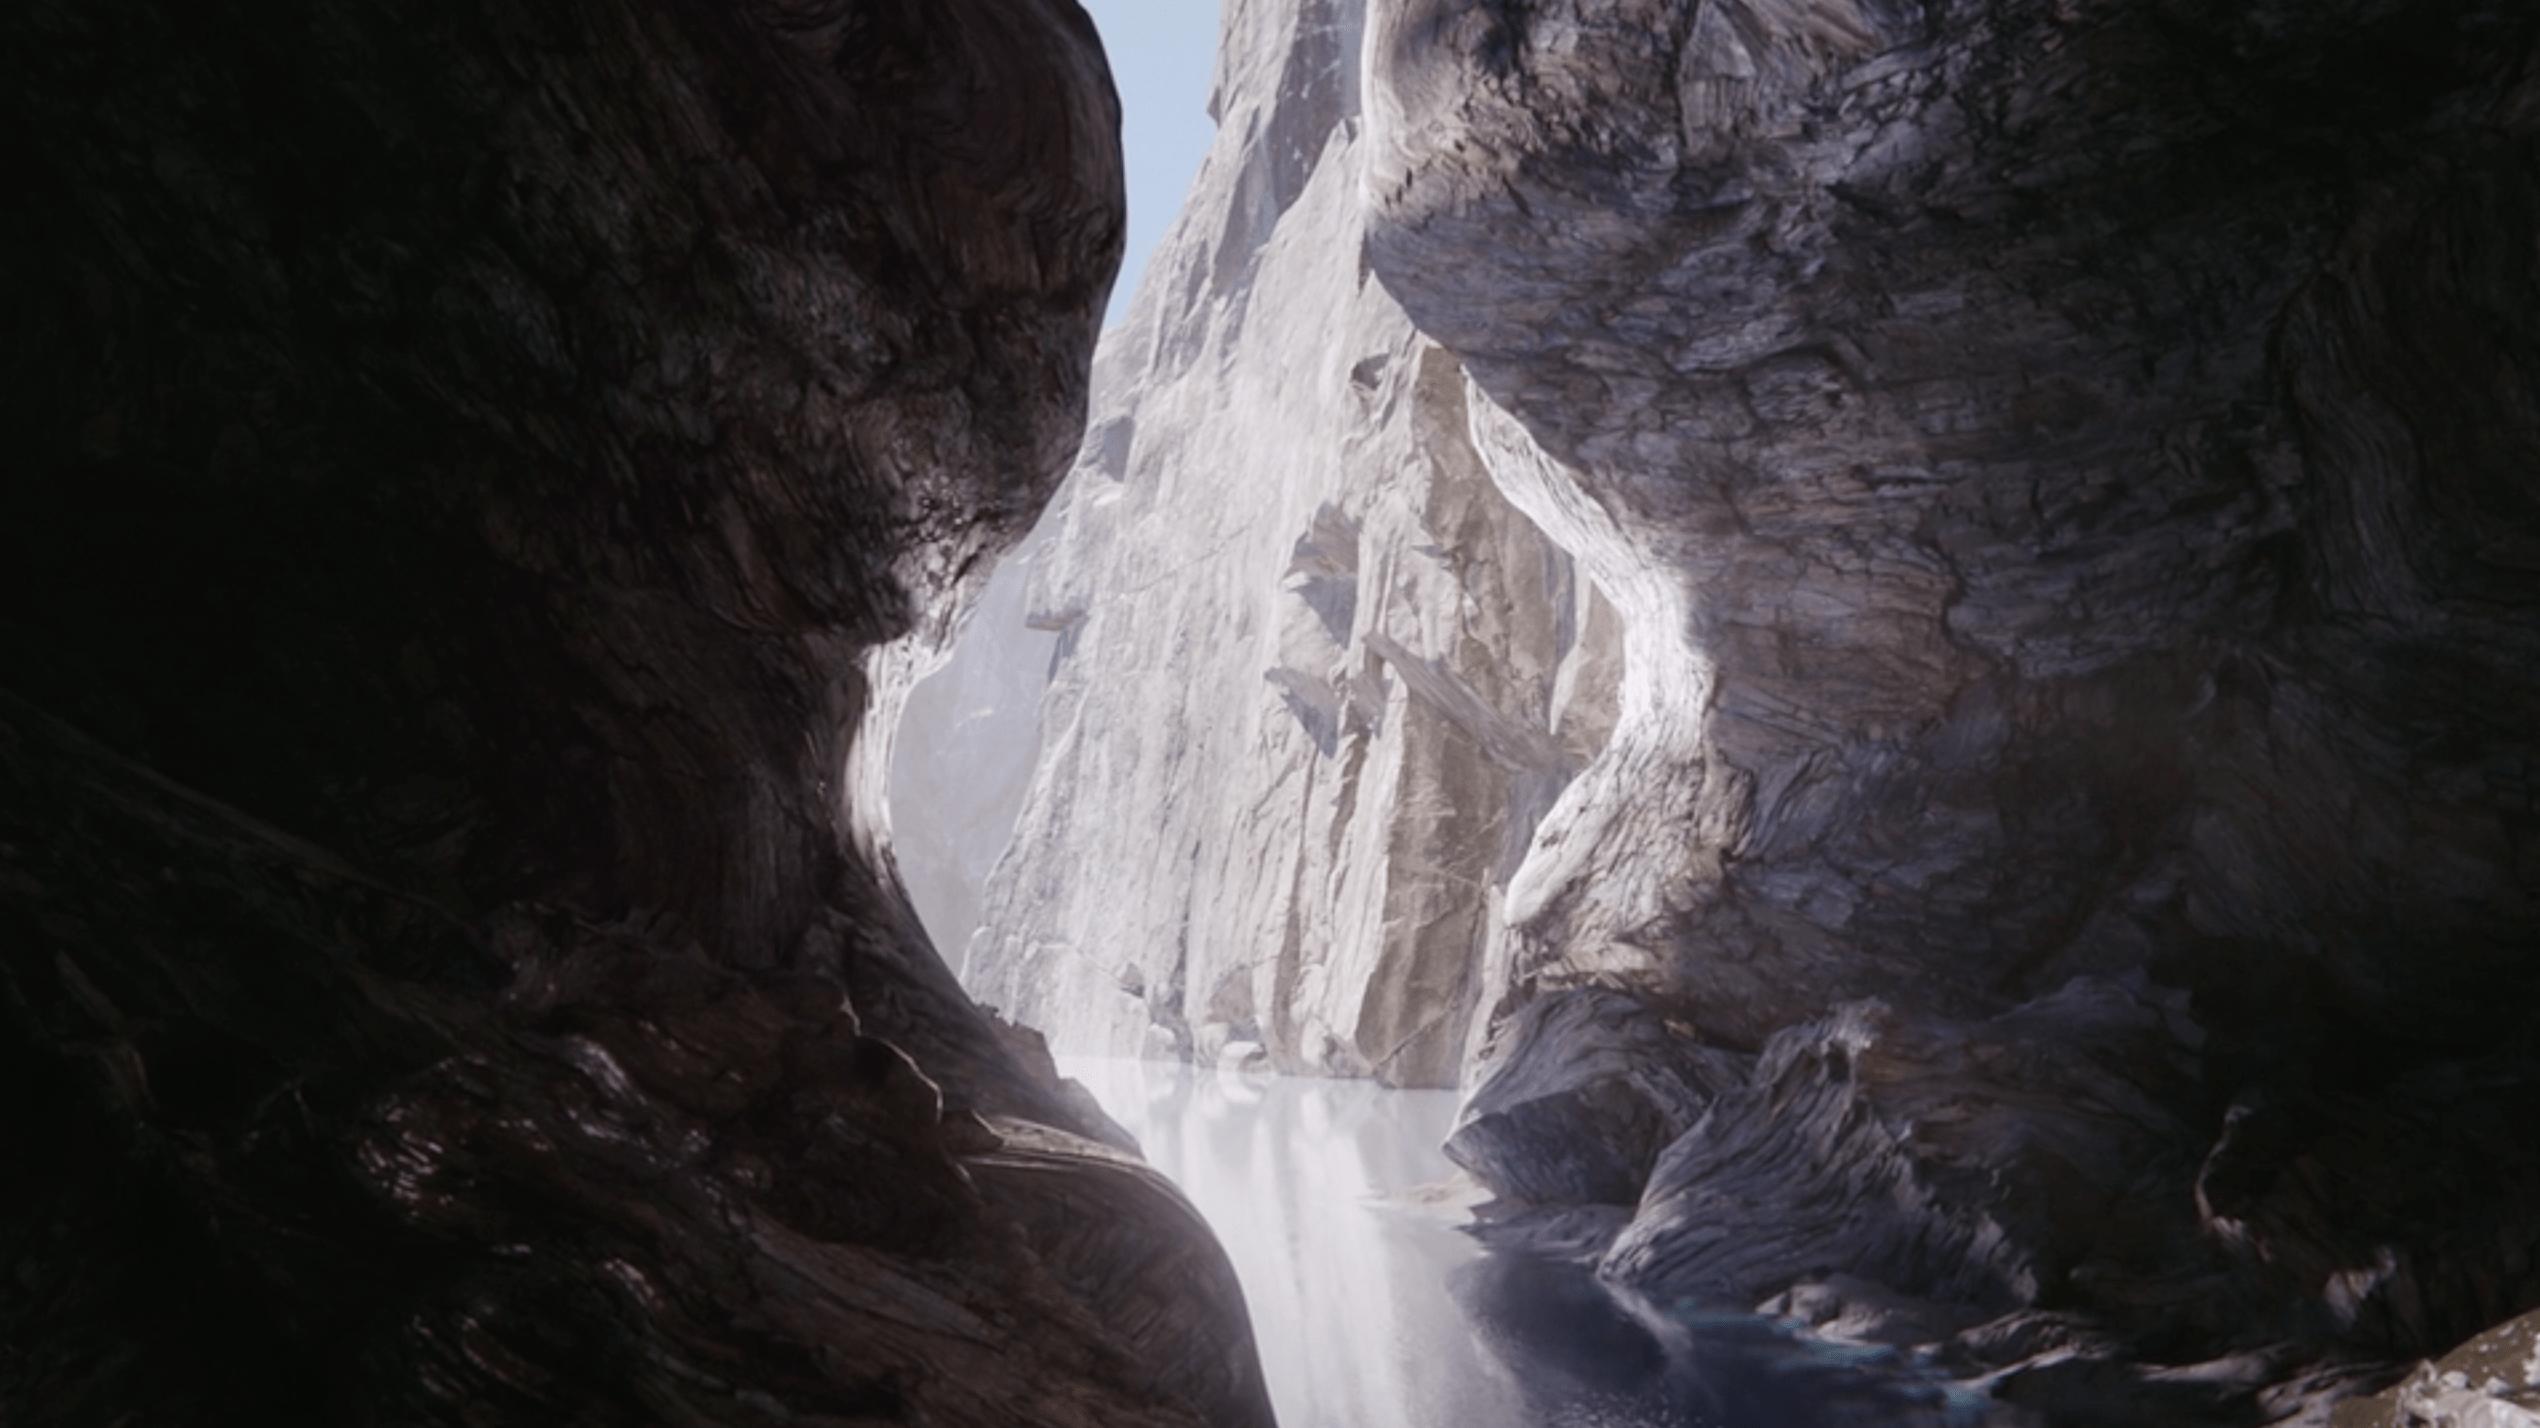 Deep dark gorge illuminating representing honesty and transparency VFX